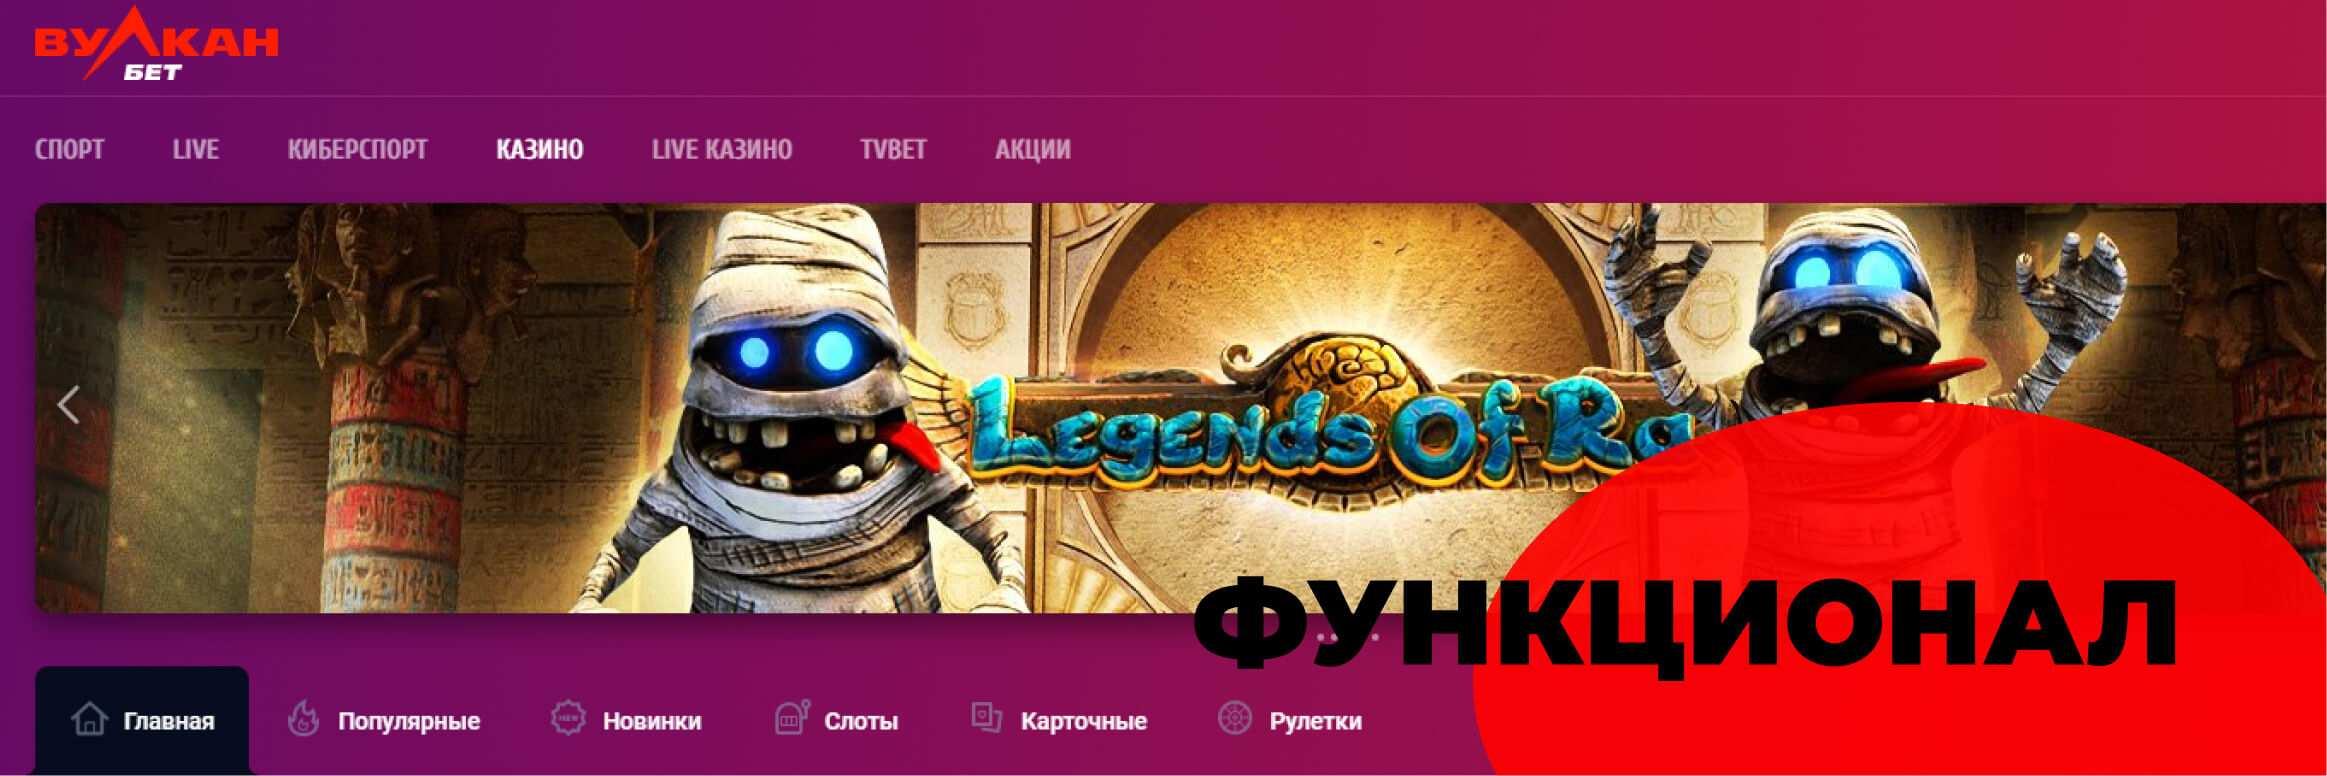 Вулканбет 🎯 официальный сайт vulkan bet casino